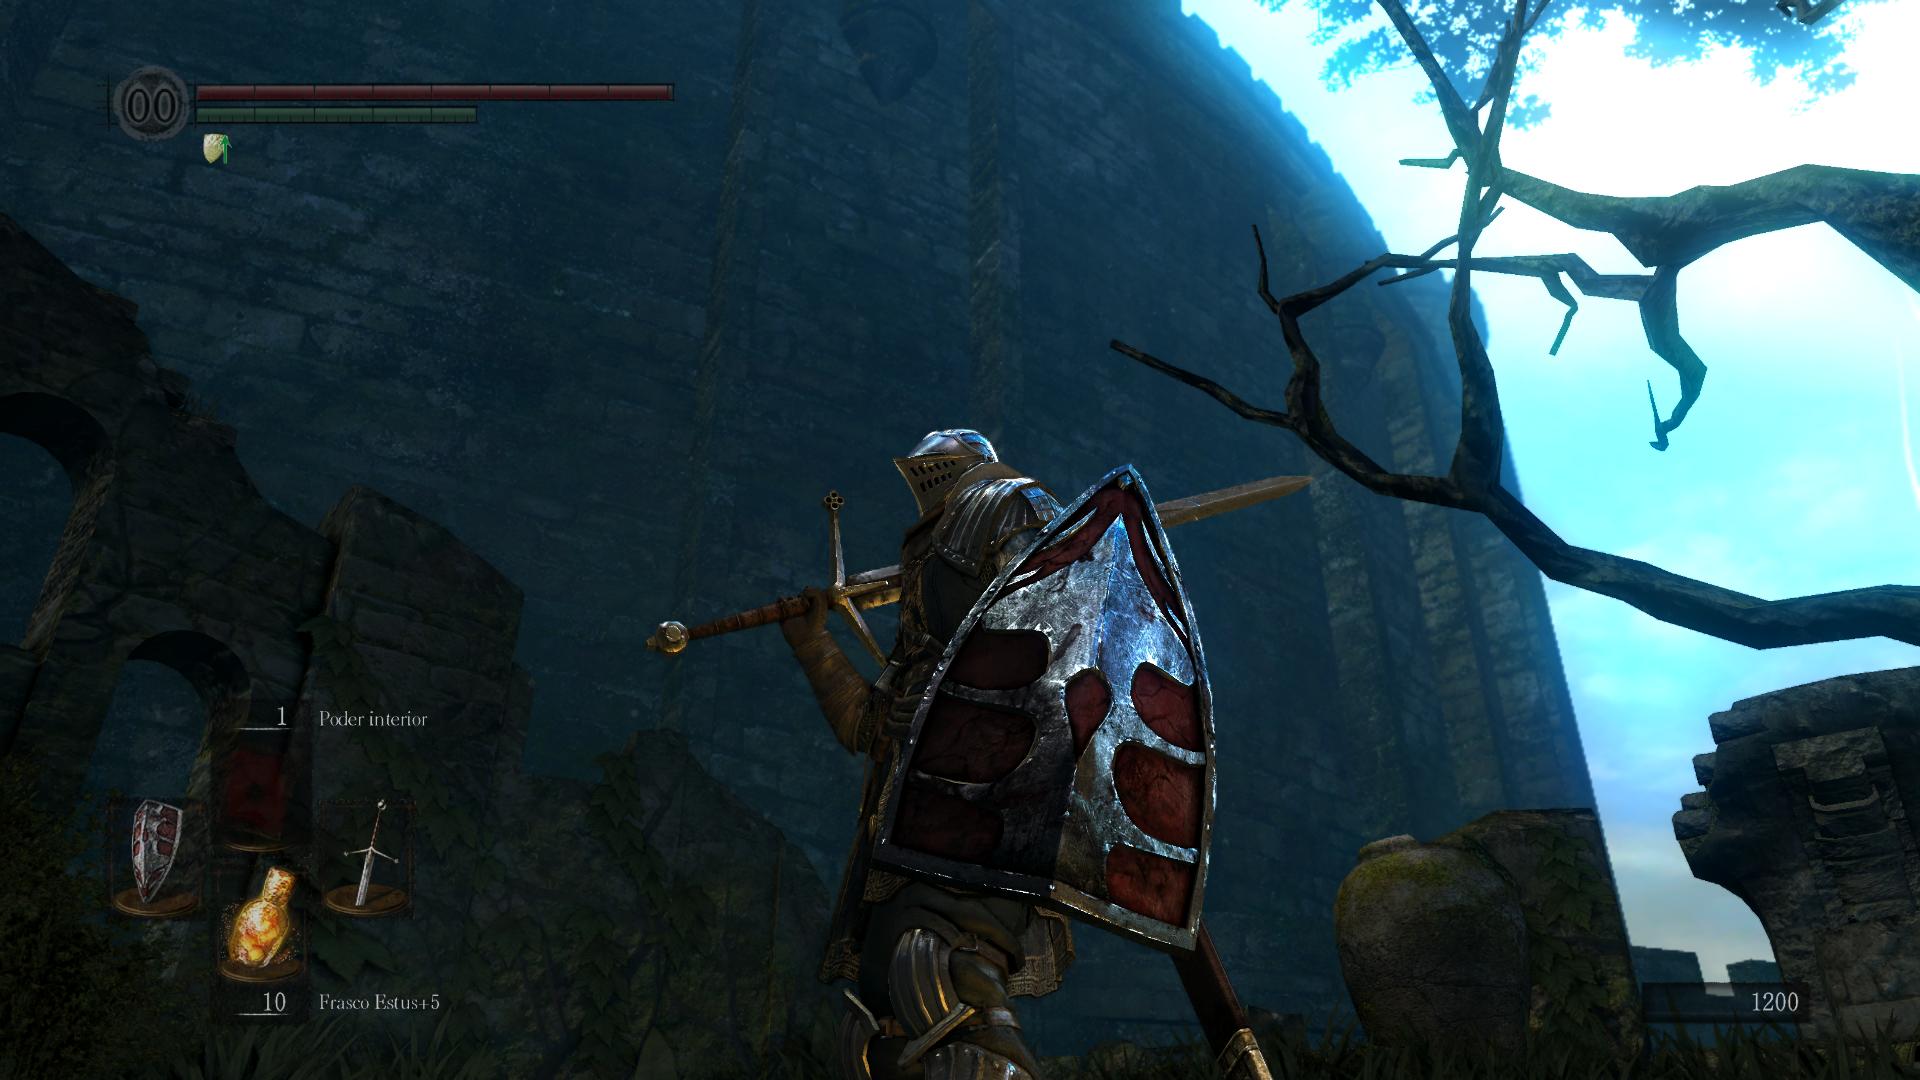 Dark Souls 2 Wallpapers Hd Download: Dark Souls HD Wallpaper